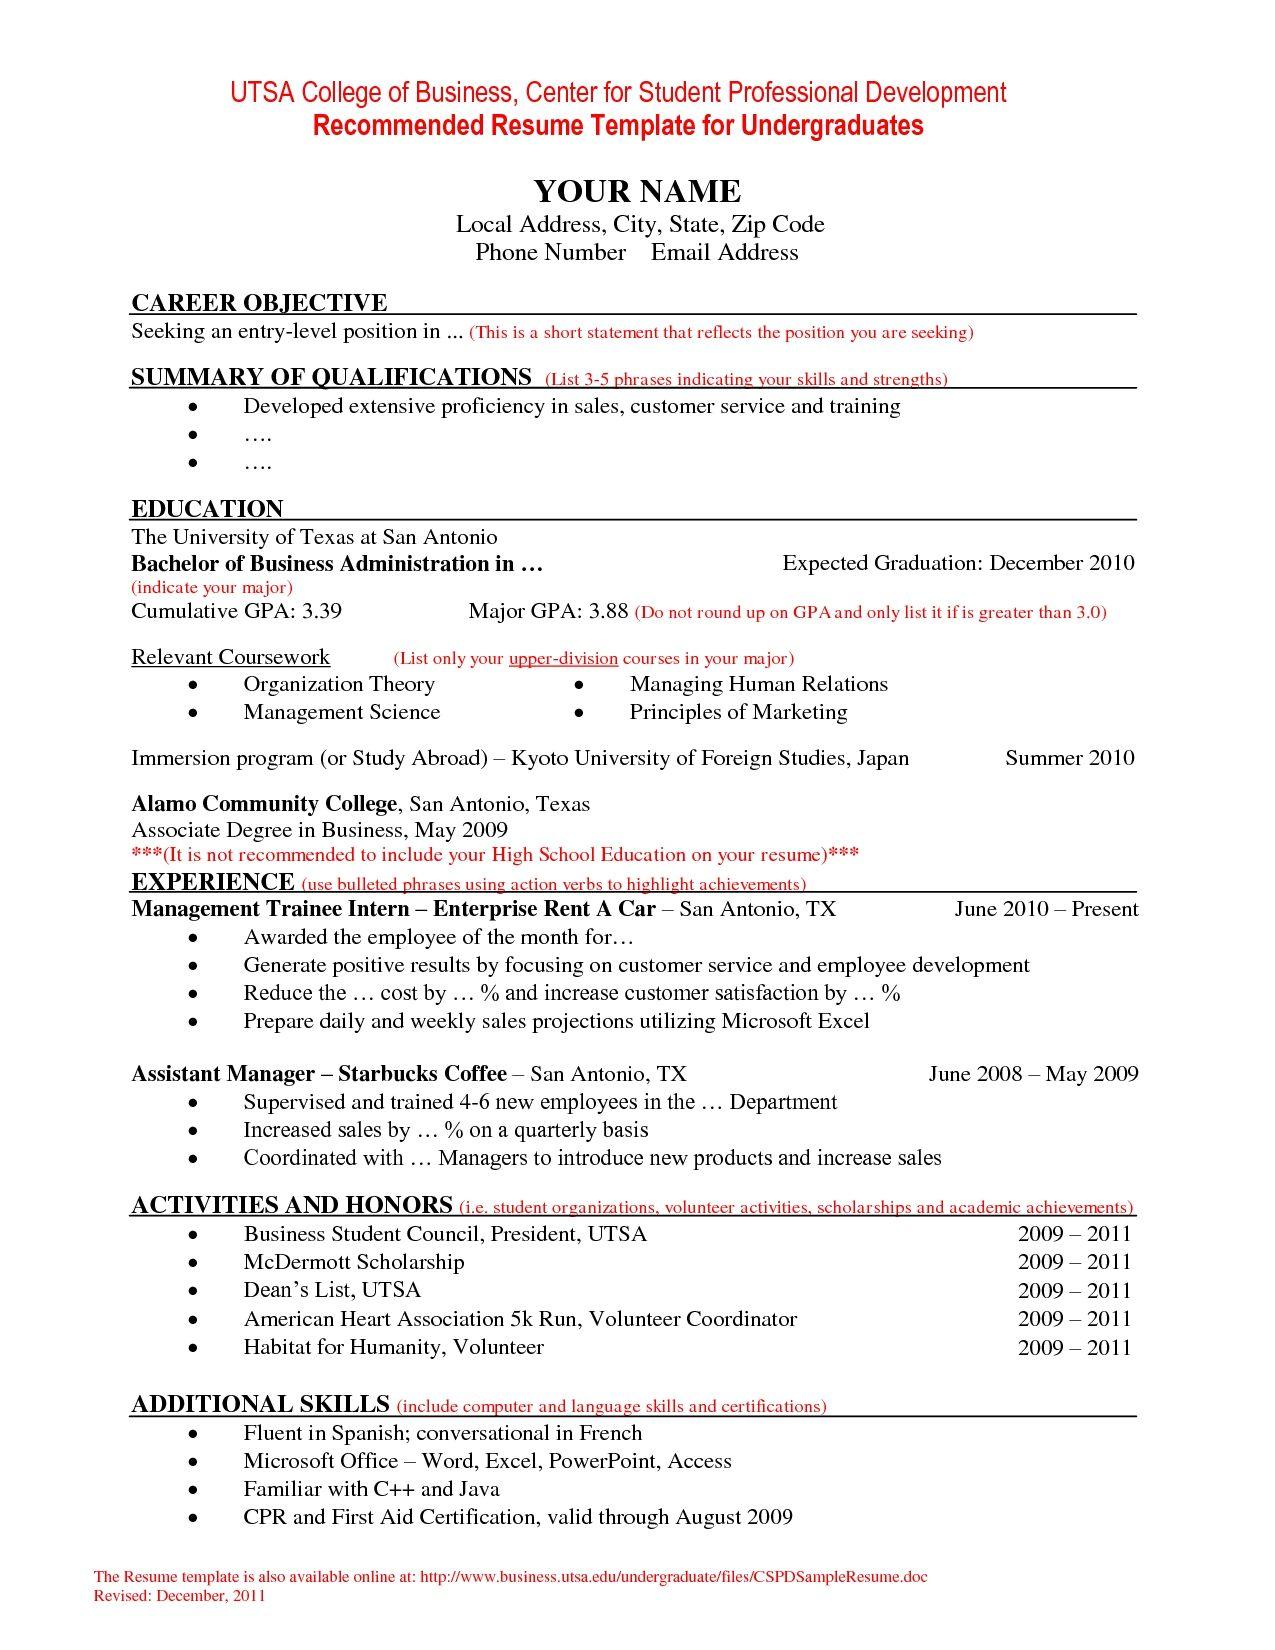 Resume Format Jedegal Format Jedegal Resume Resume Format